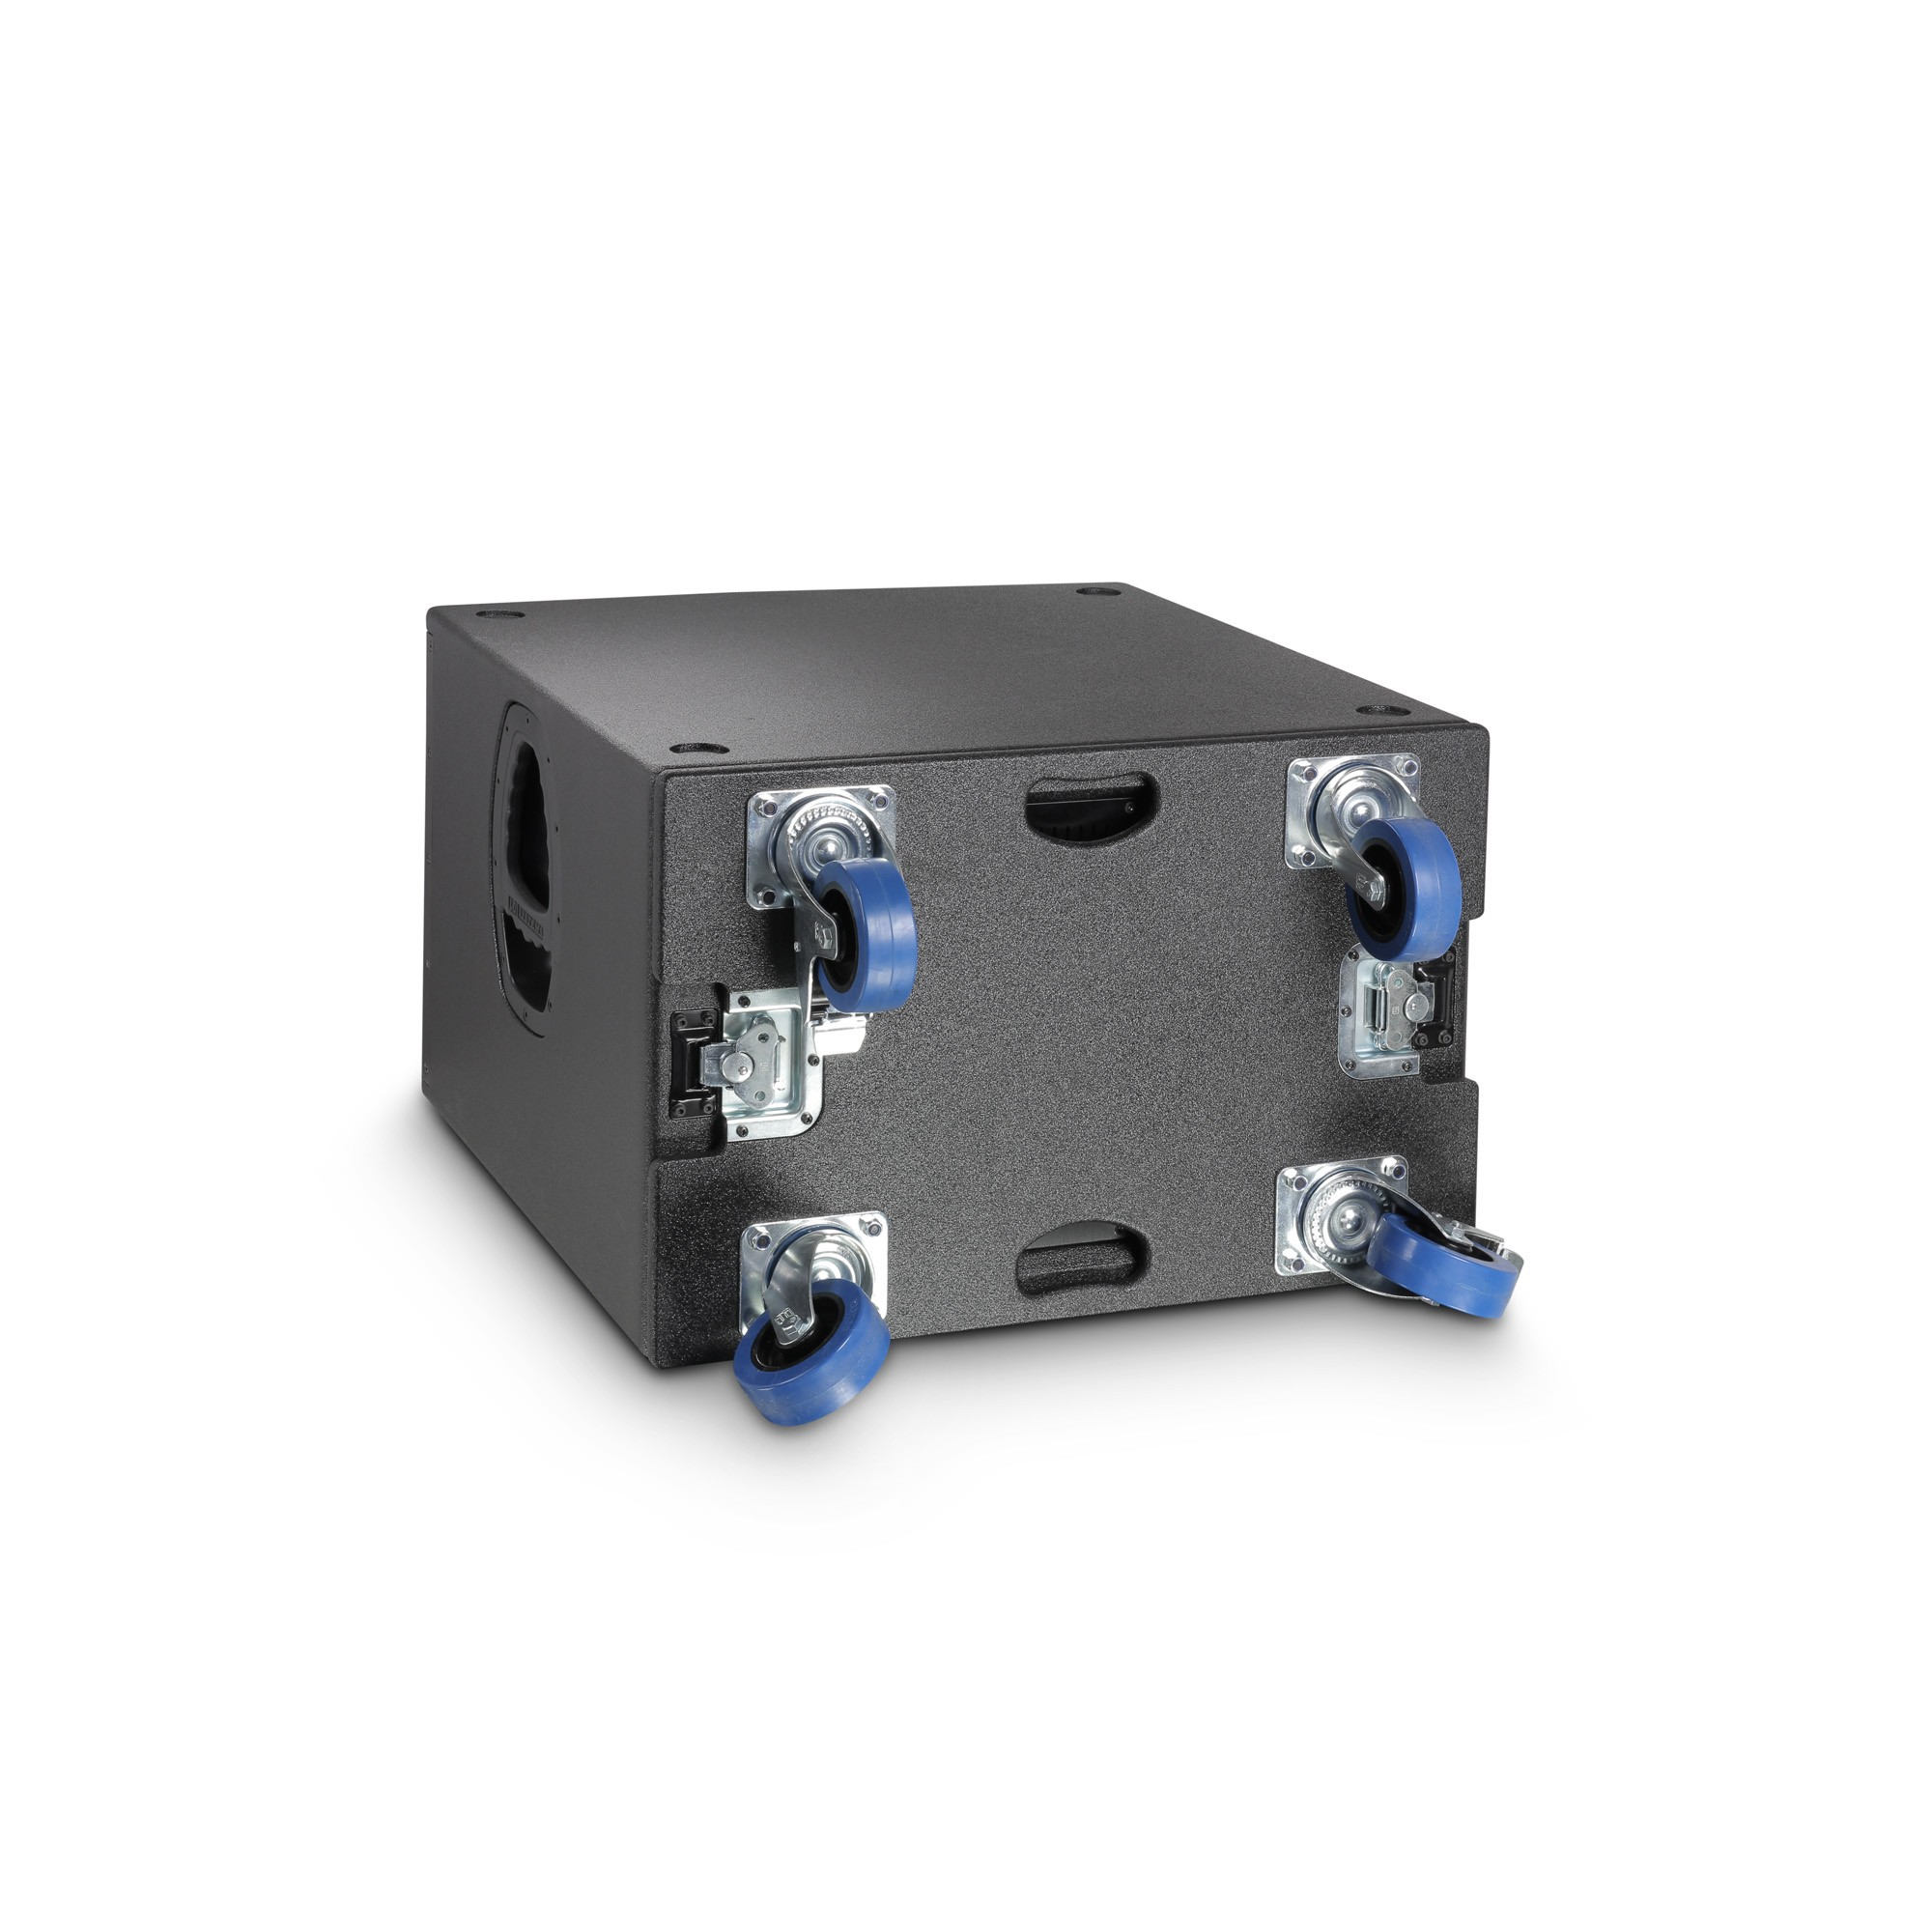 MAUI 44 CB Castor Board for LD MAUI 44 Column active PA System